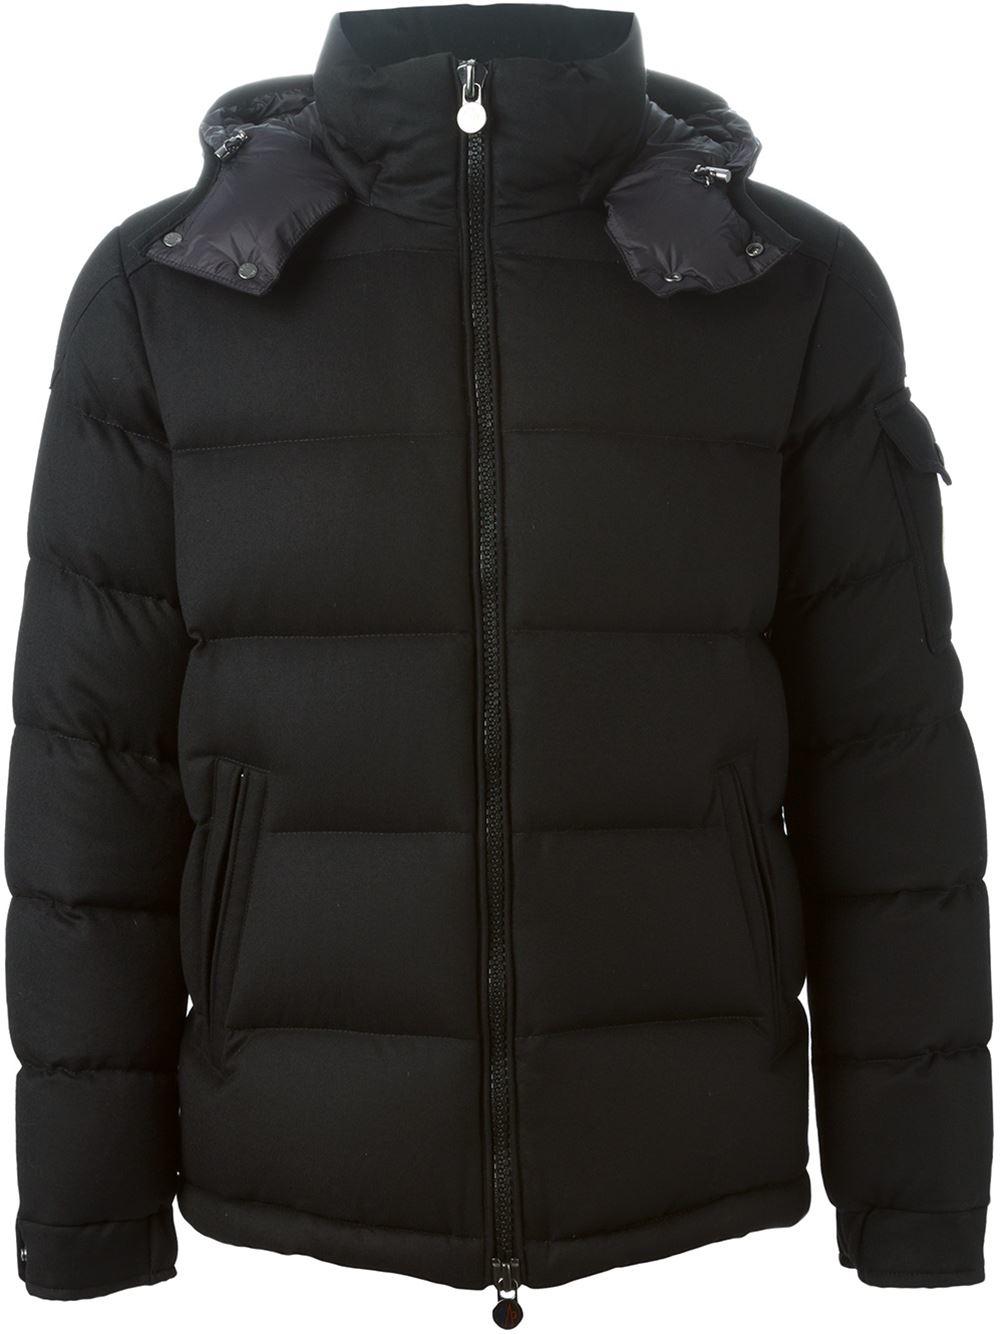 Moncler 'montgenevre' Padded Jacket in Black for Men | Lyst